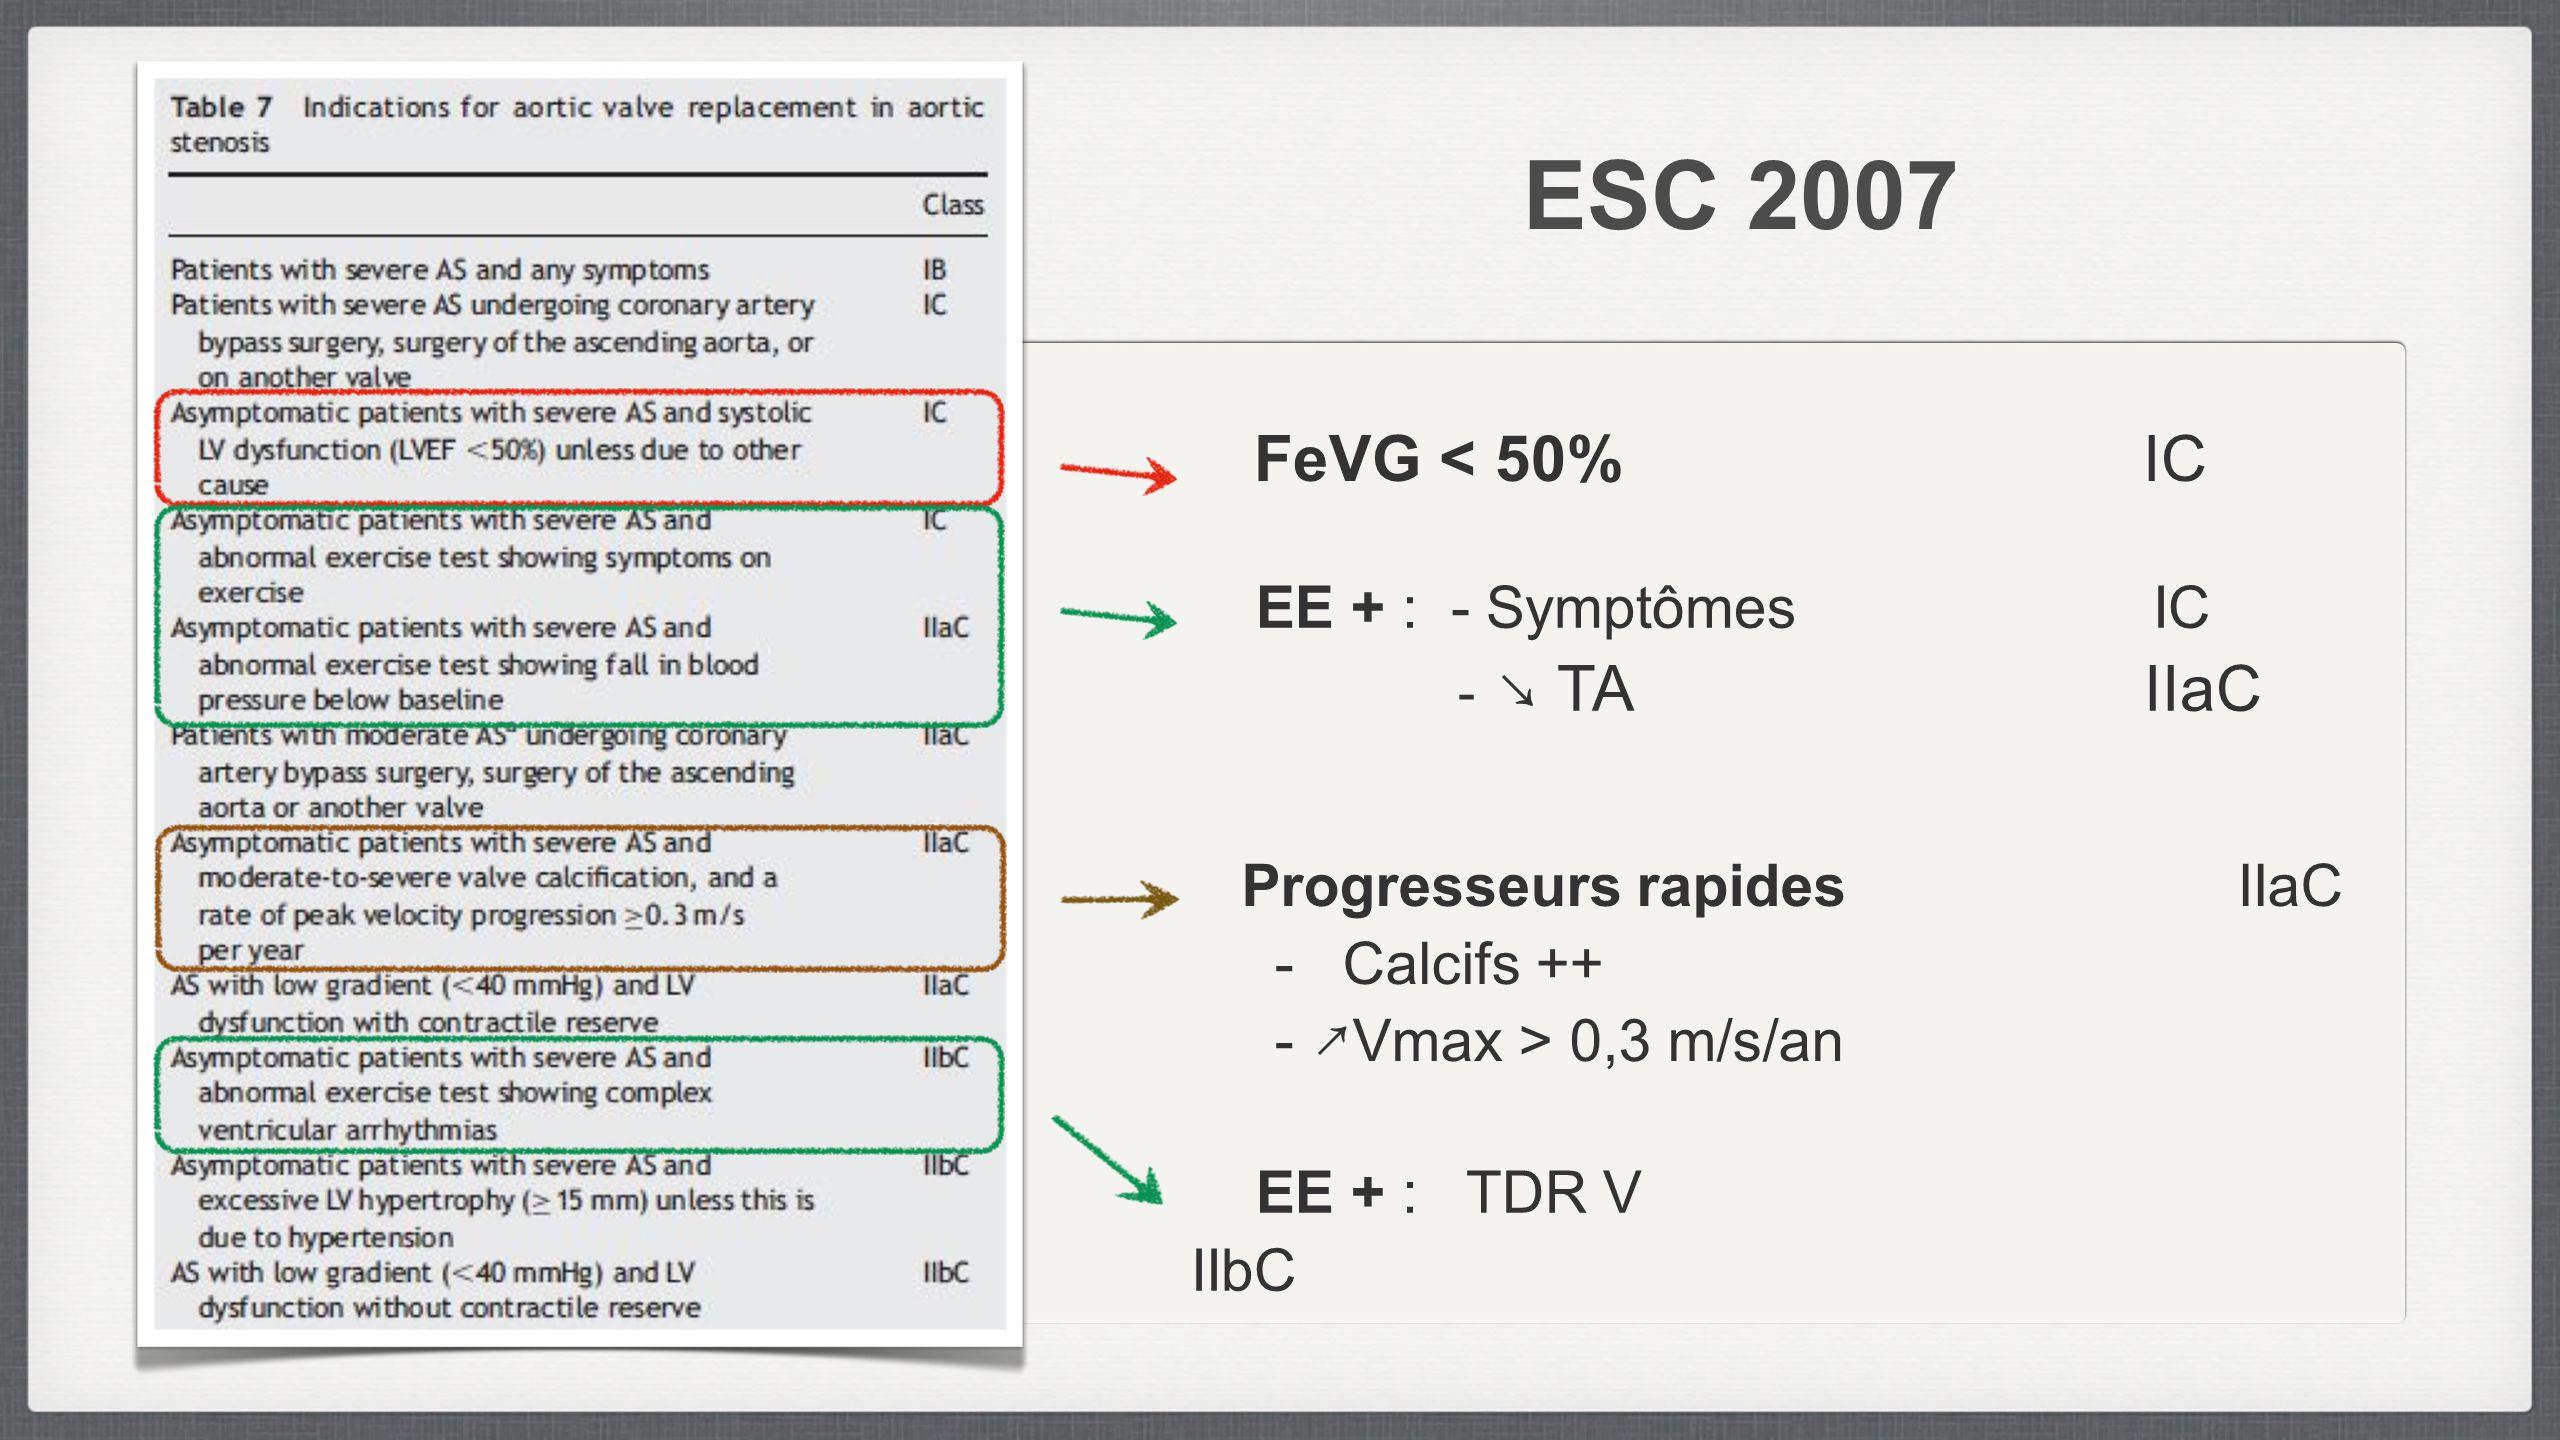 ESC 2007 FeVG < 50% IC EE + : - Symptômes IC - TA IIaC EE + : TDR V IIbC Progresseurs rapides IIaC - Calcifs ++ - Vmax > 0,3 m/s/an